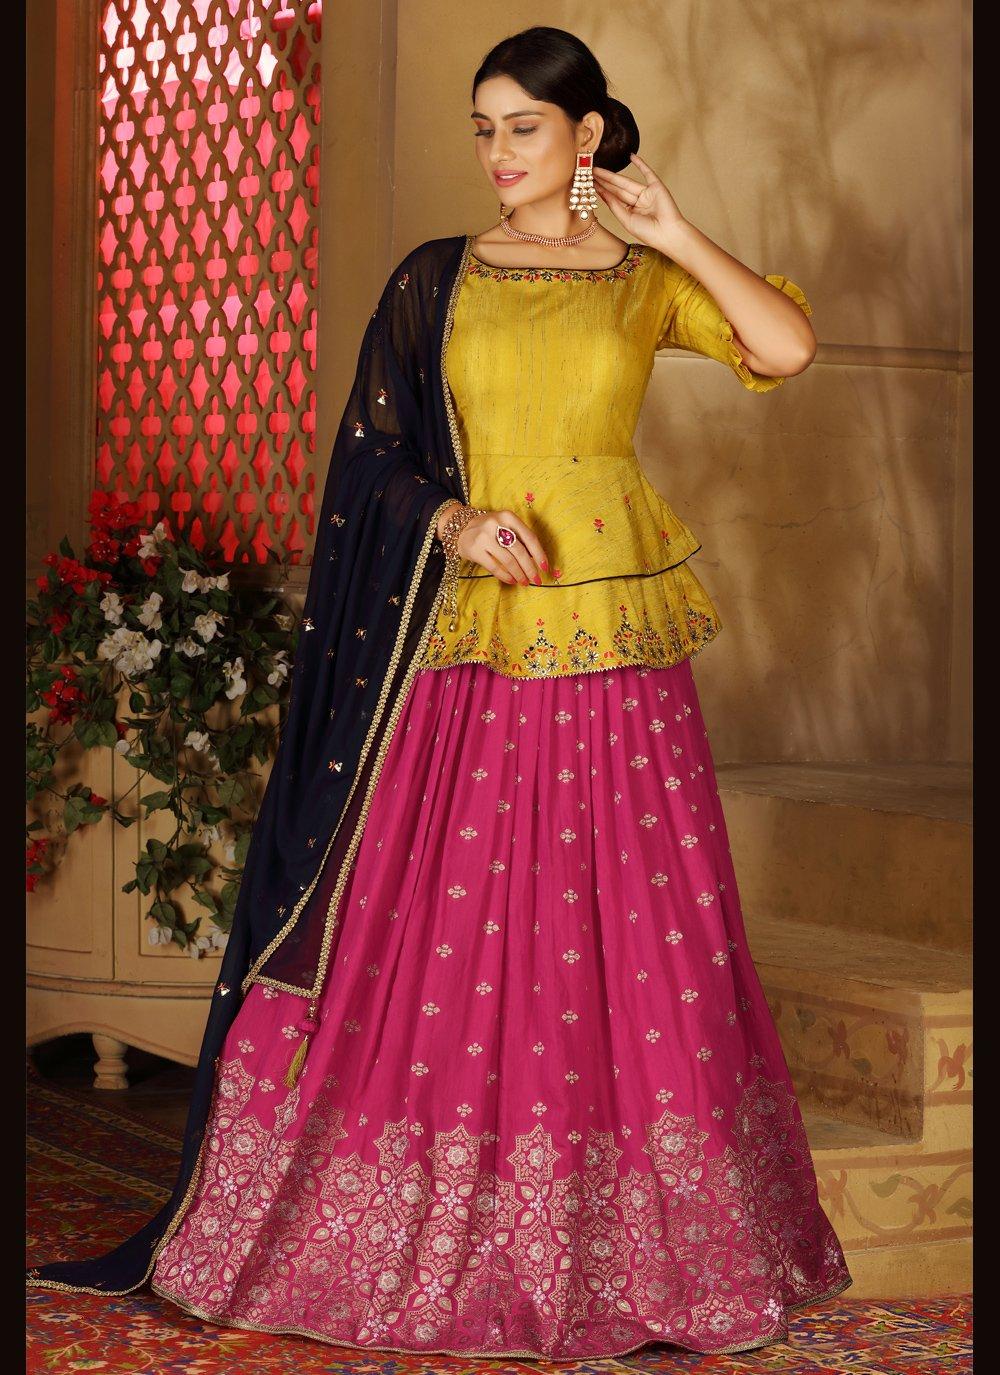 Fancy Silk Readymade Lehenga Choli in Hot Pink and Yellow